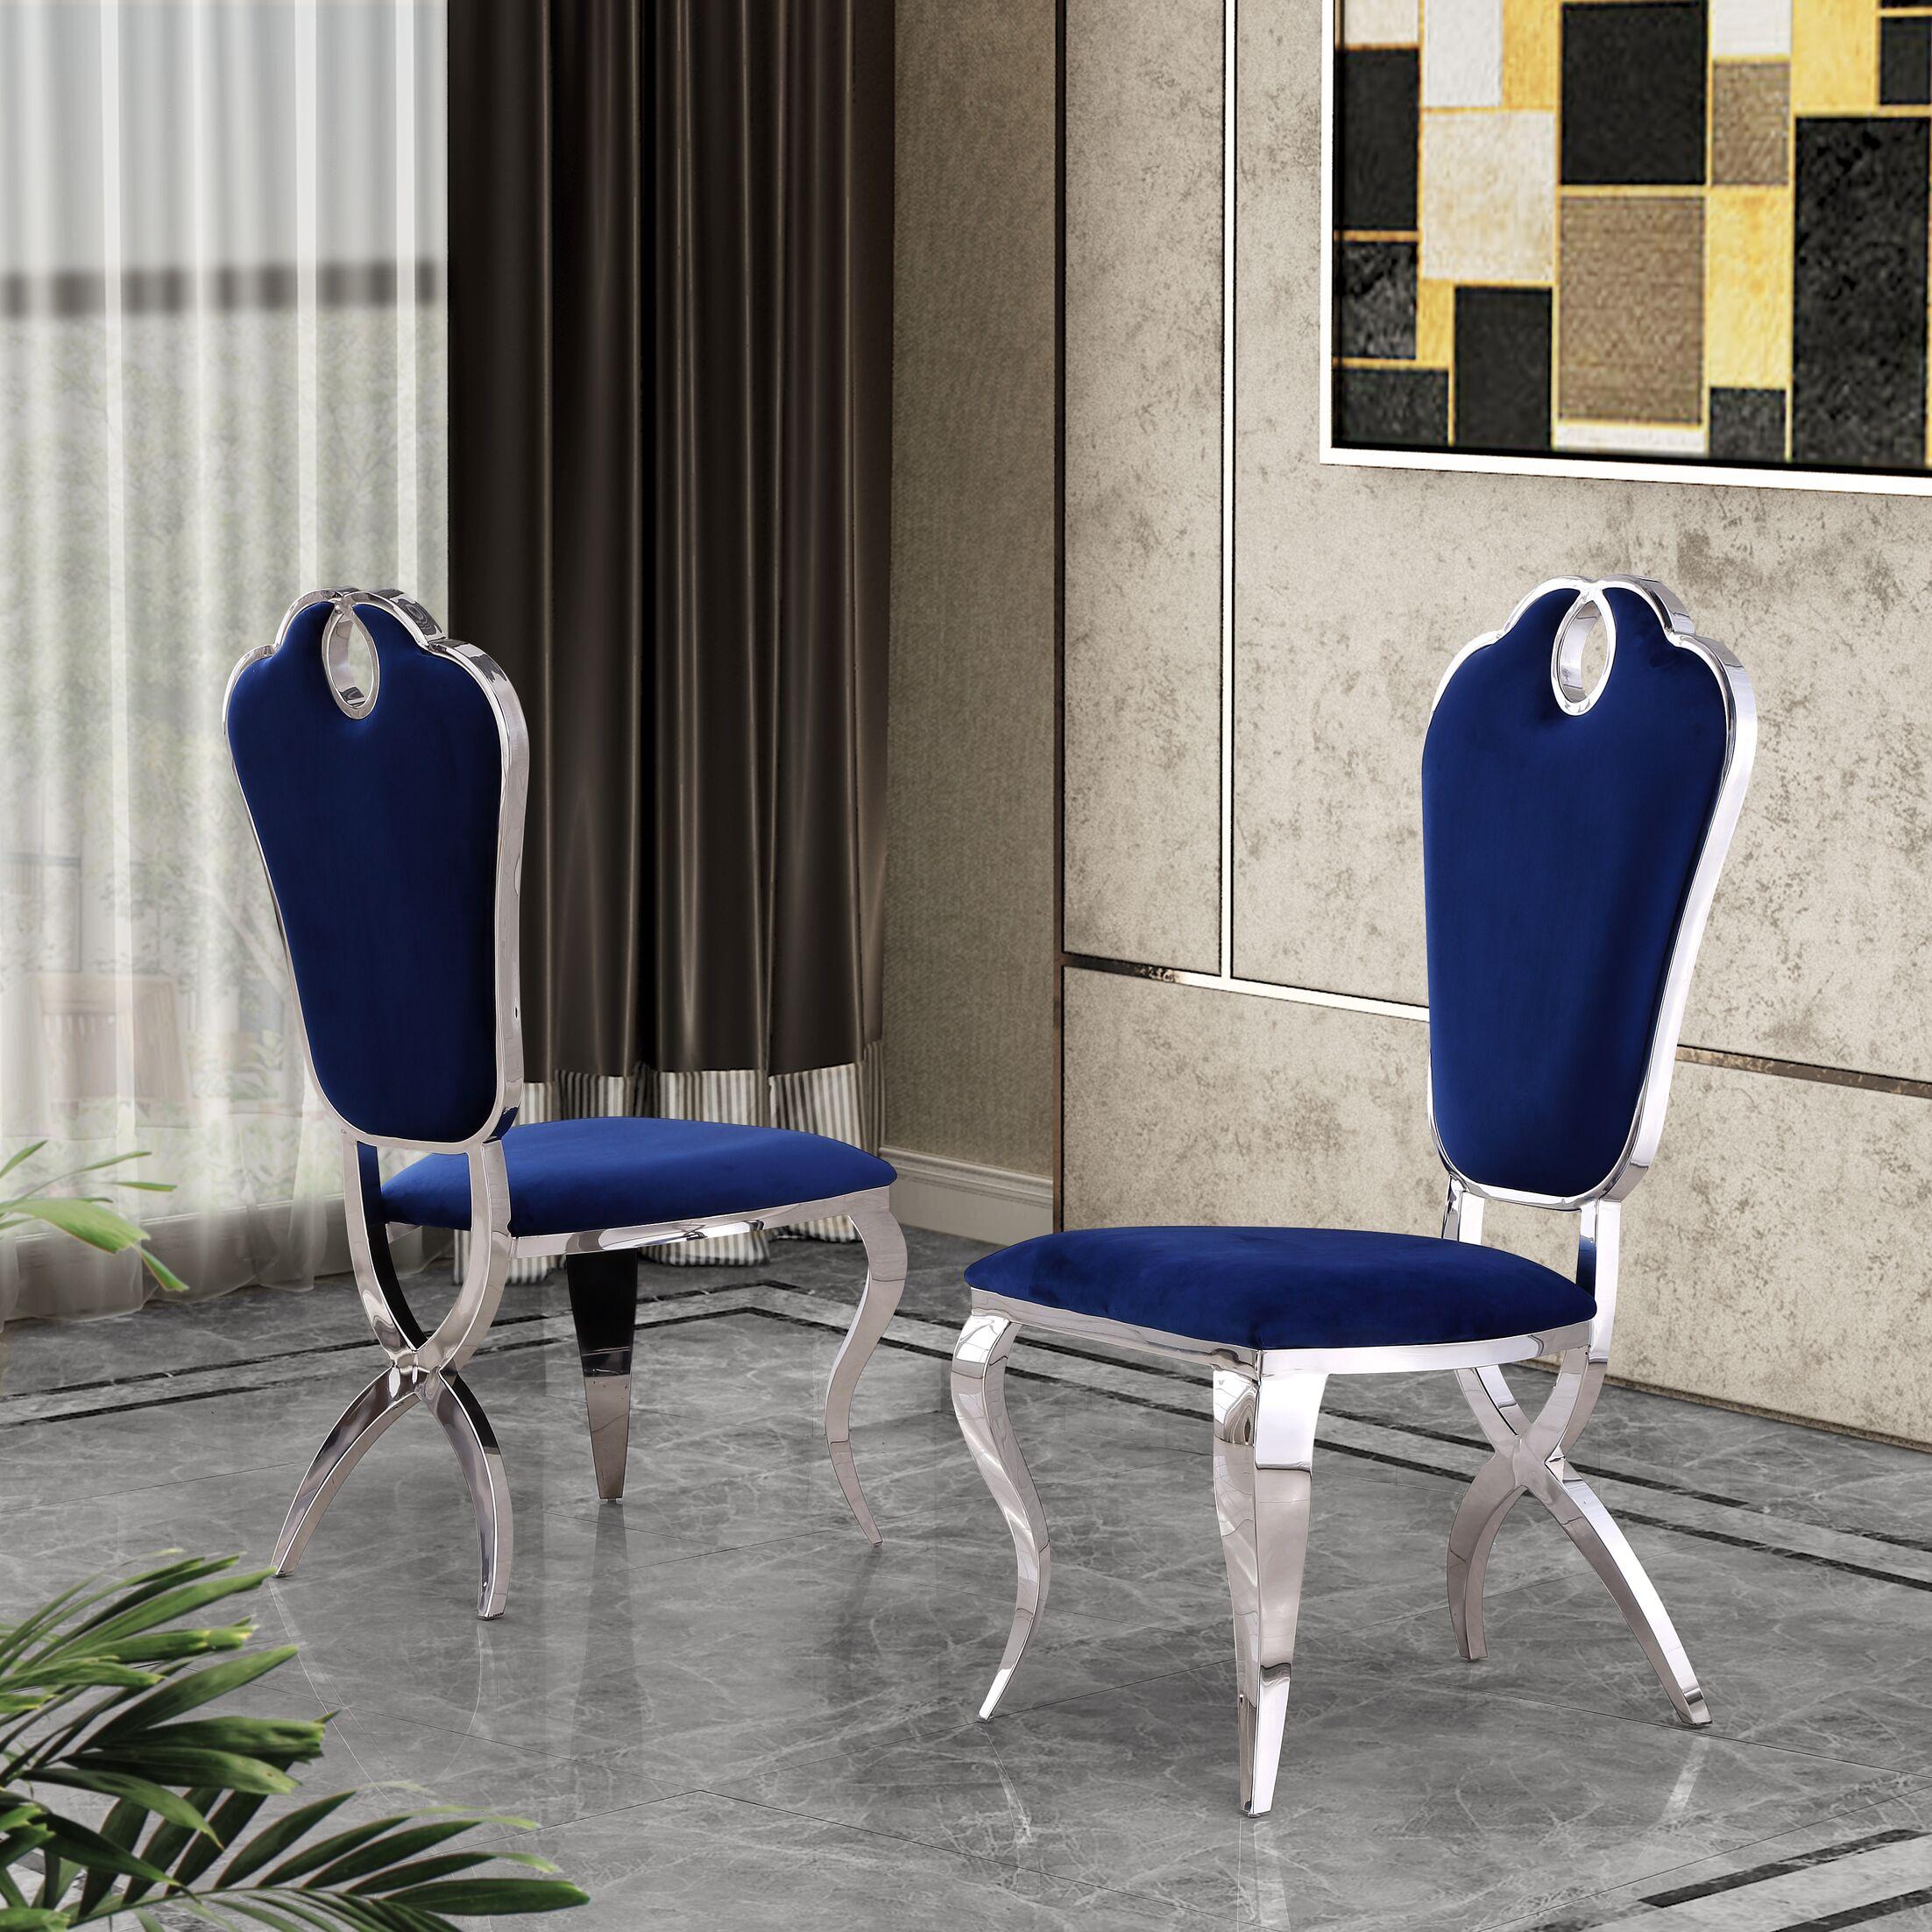 Malt Upholstered Dining Chair Upholstery Color: Navy Blue